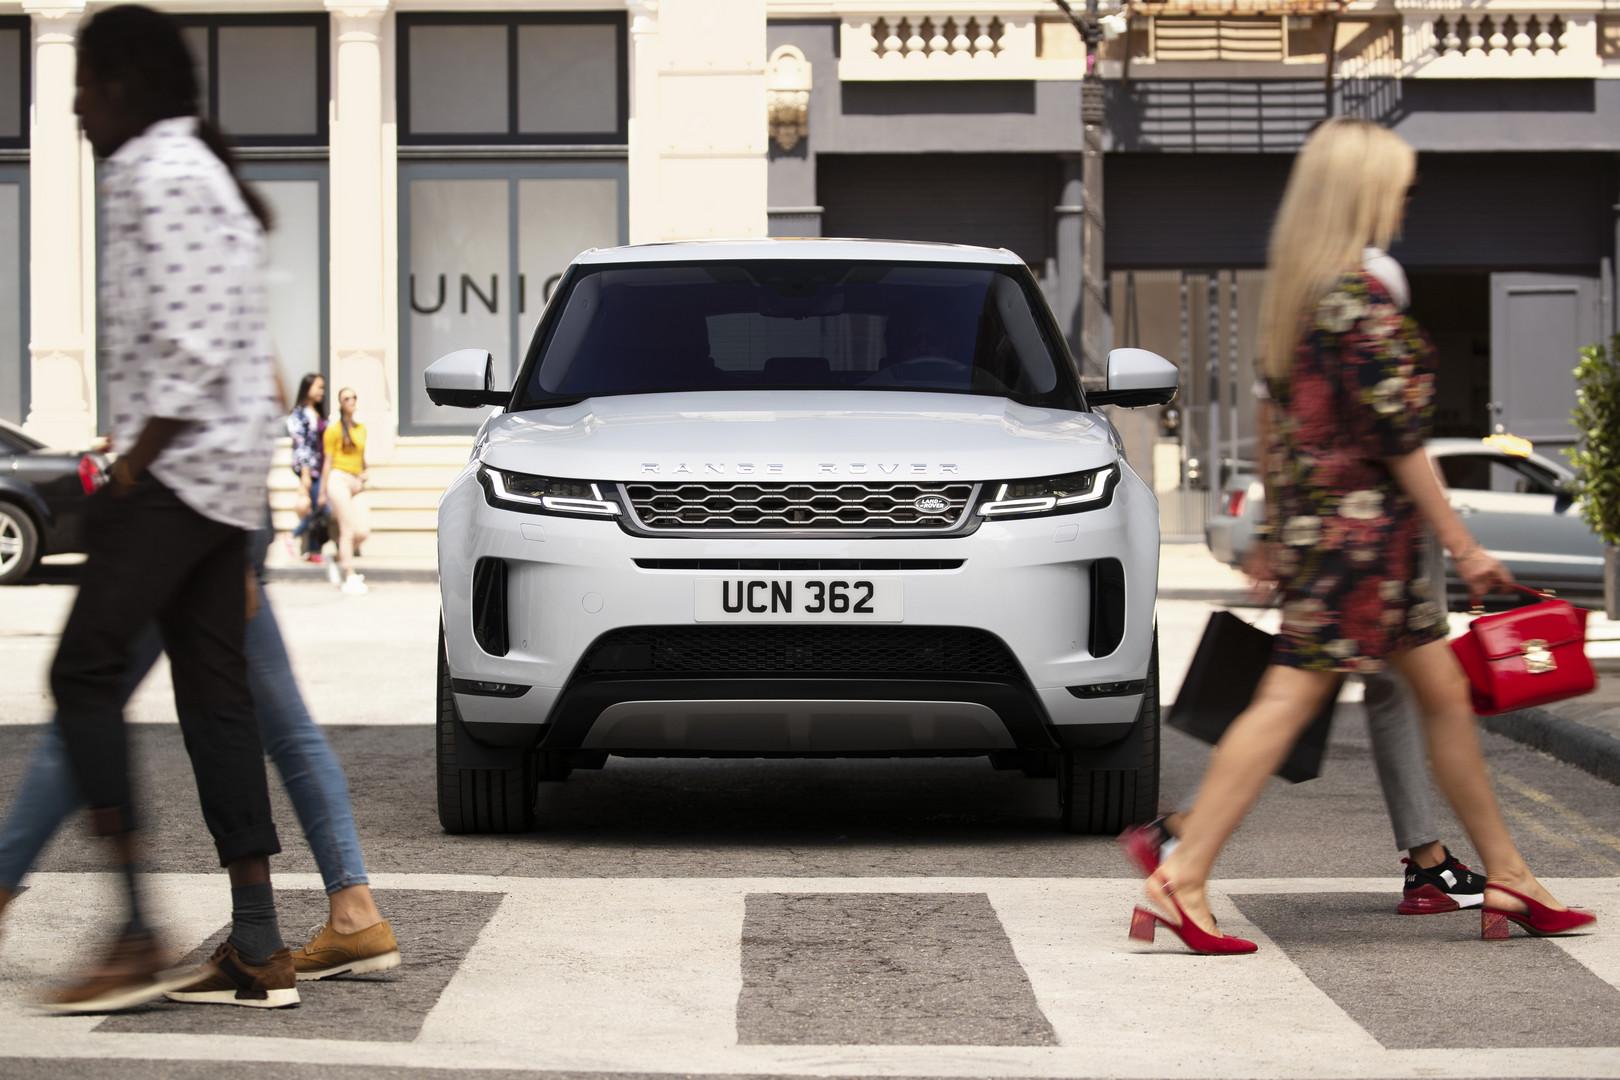 2019 Range Rover Evoque Revealed Gtspirit